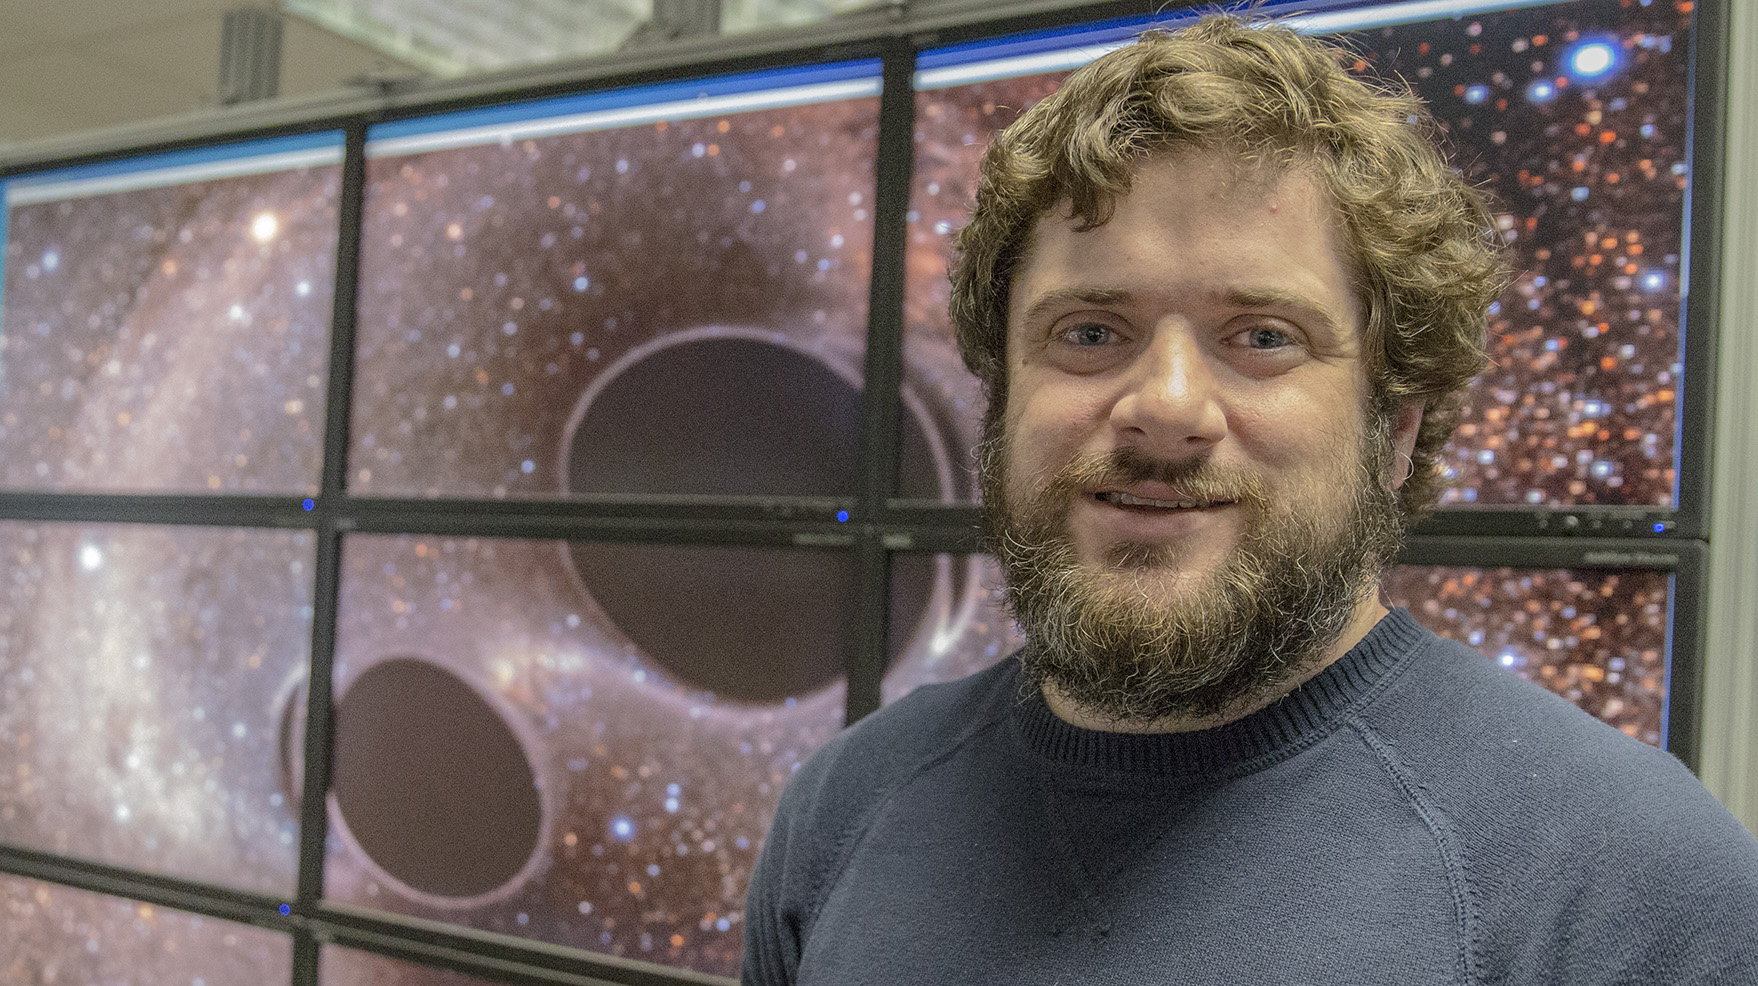 Unl Supercomputers Help Gravitational Wave Discovery